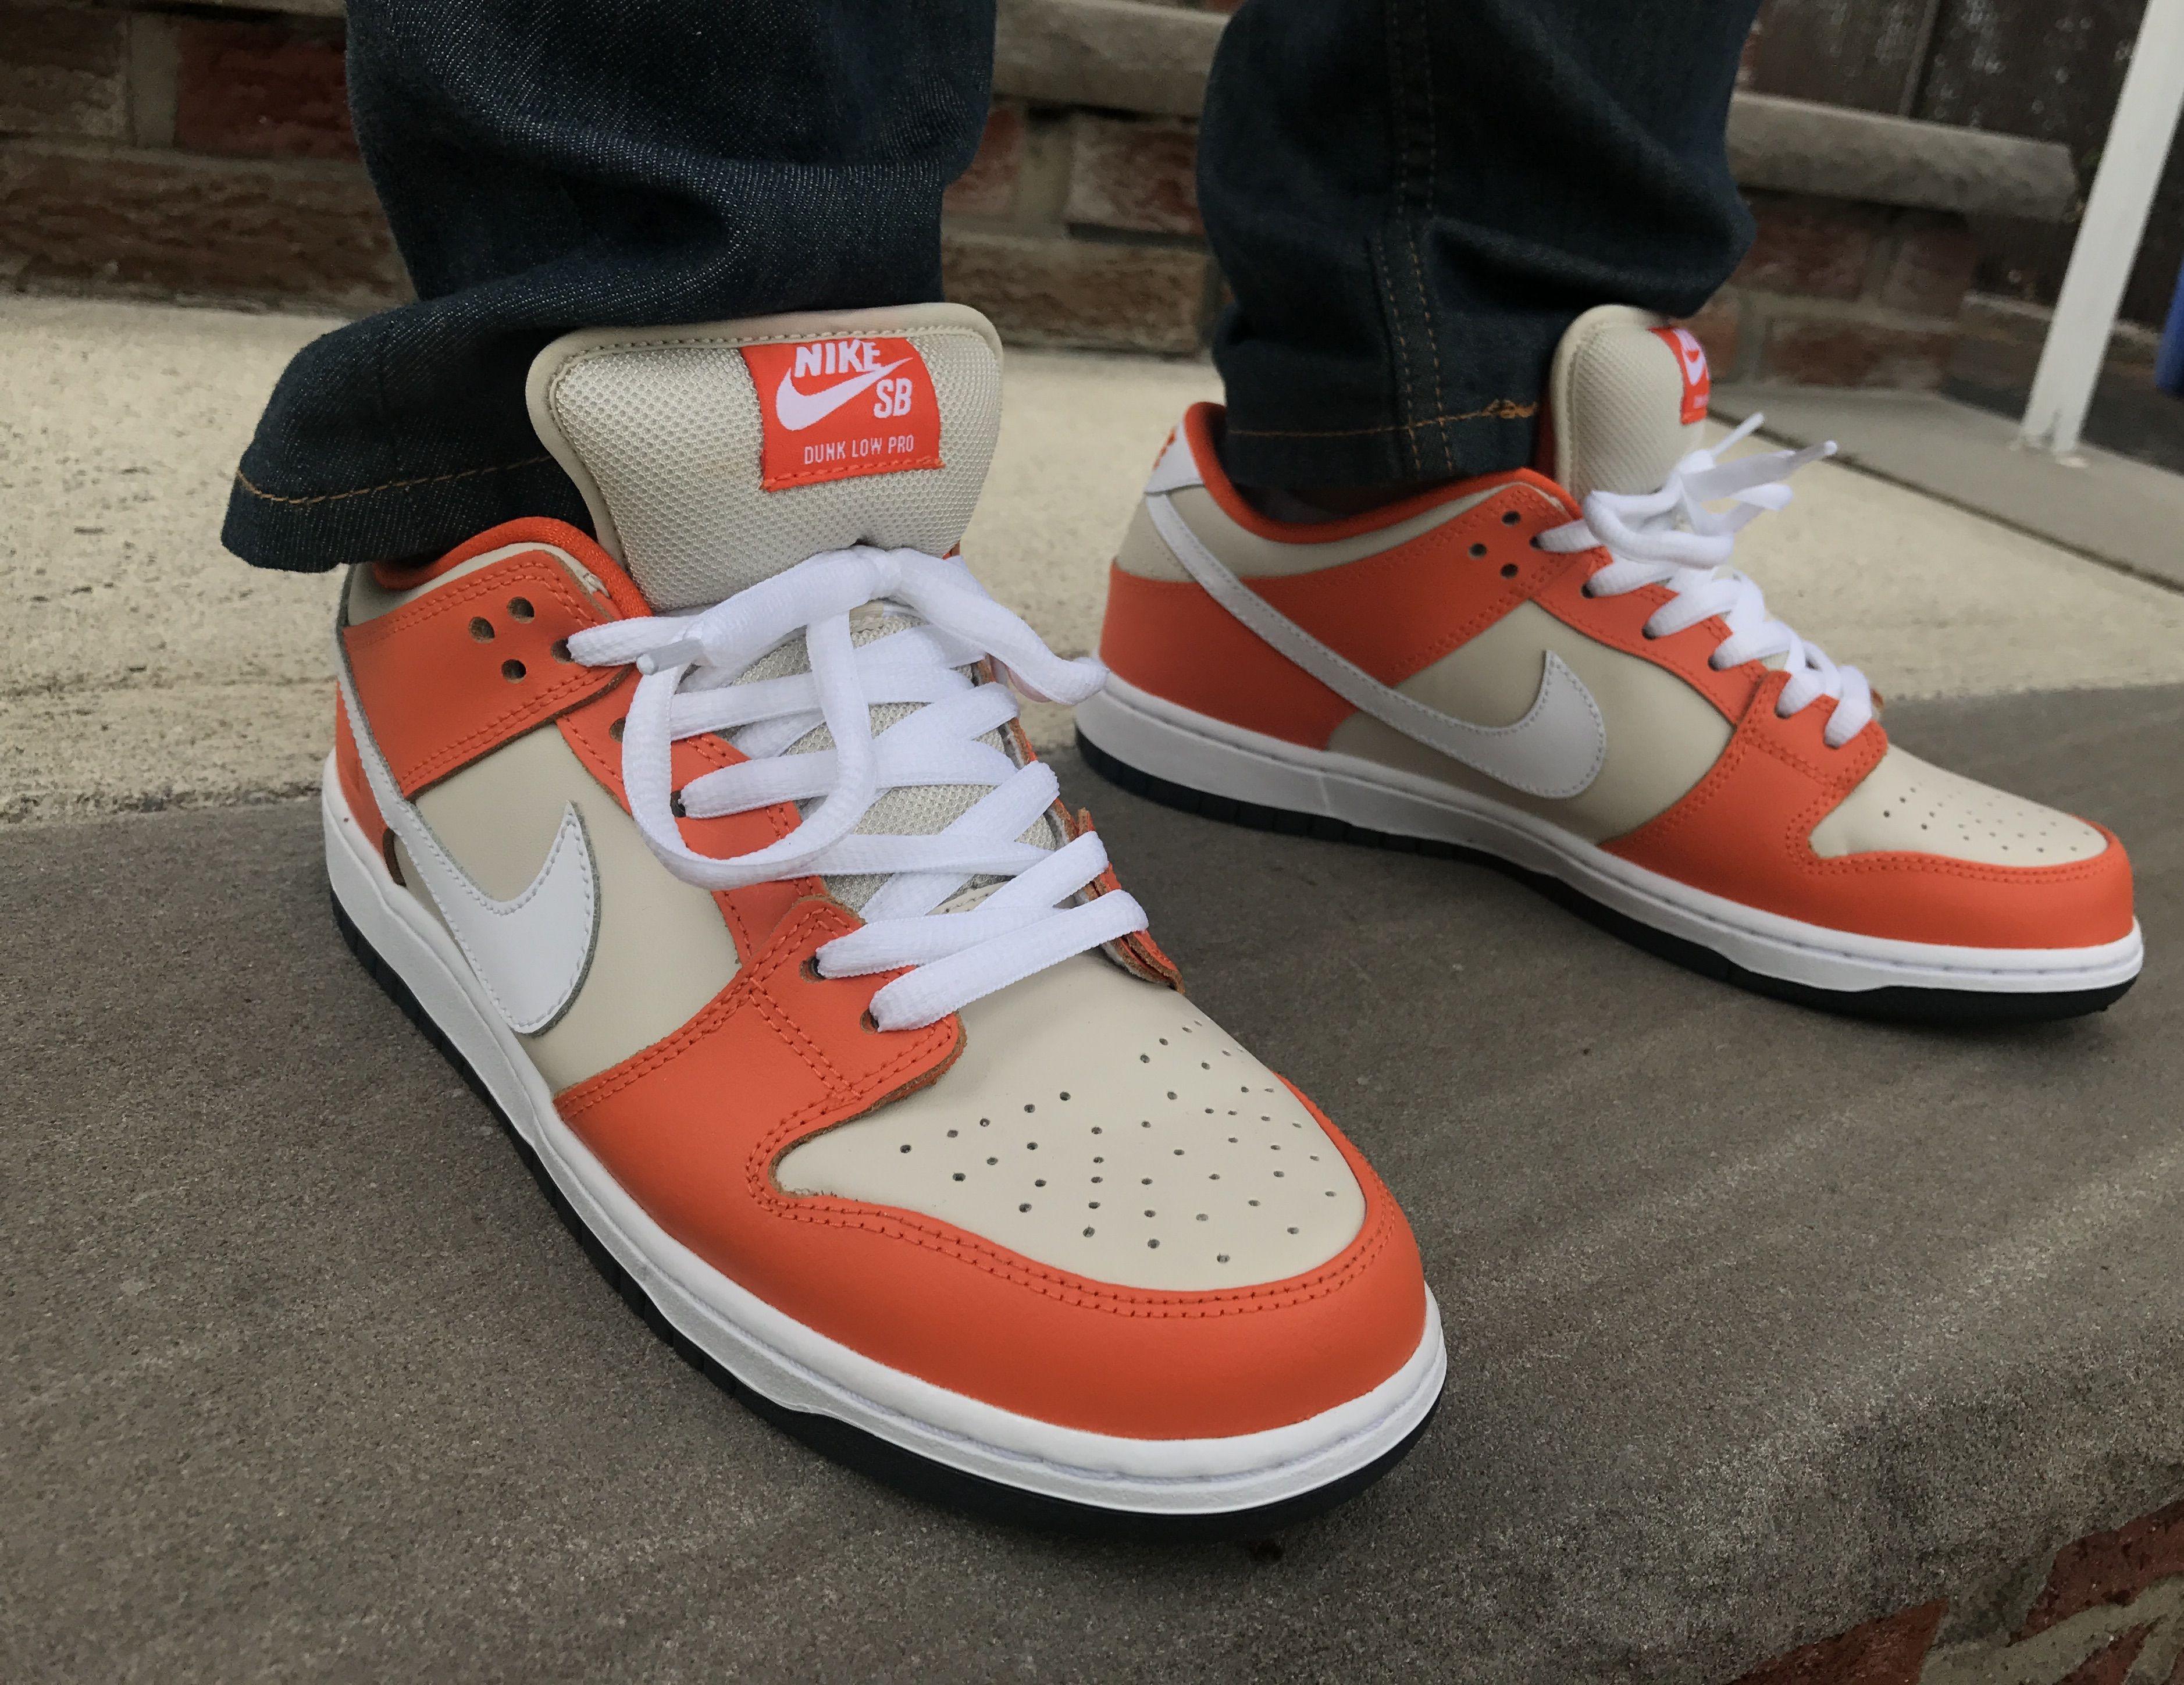 WDYWT] Nike SB Dunk Low Pro \